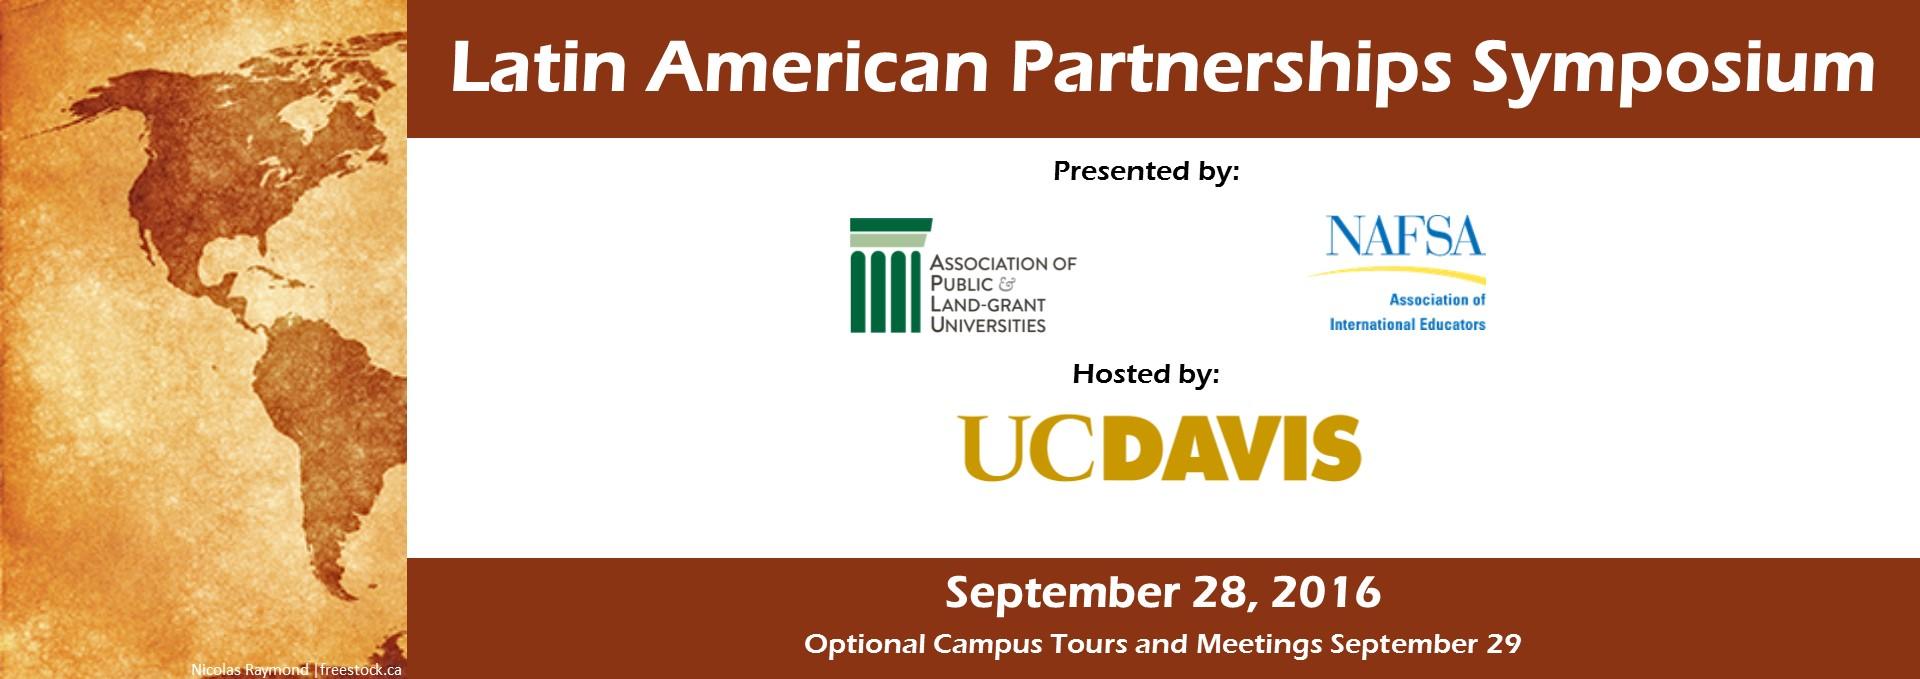 2016 APLU & NAFSA Latin American Partnerships Symposium